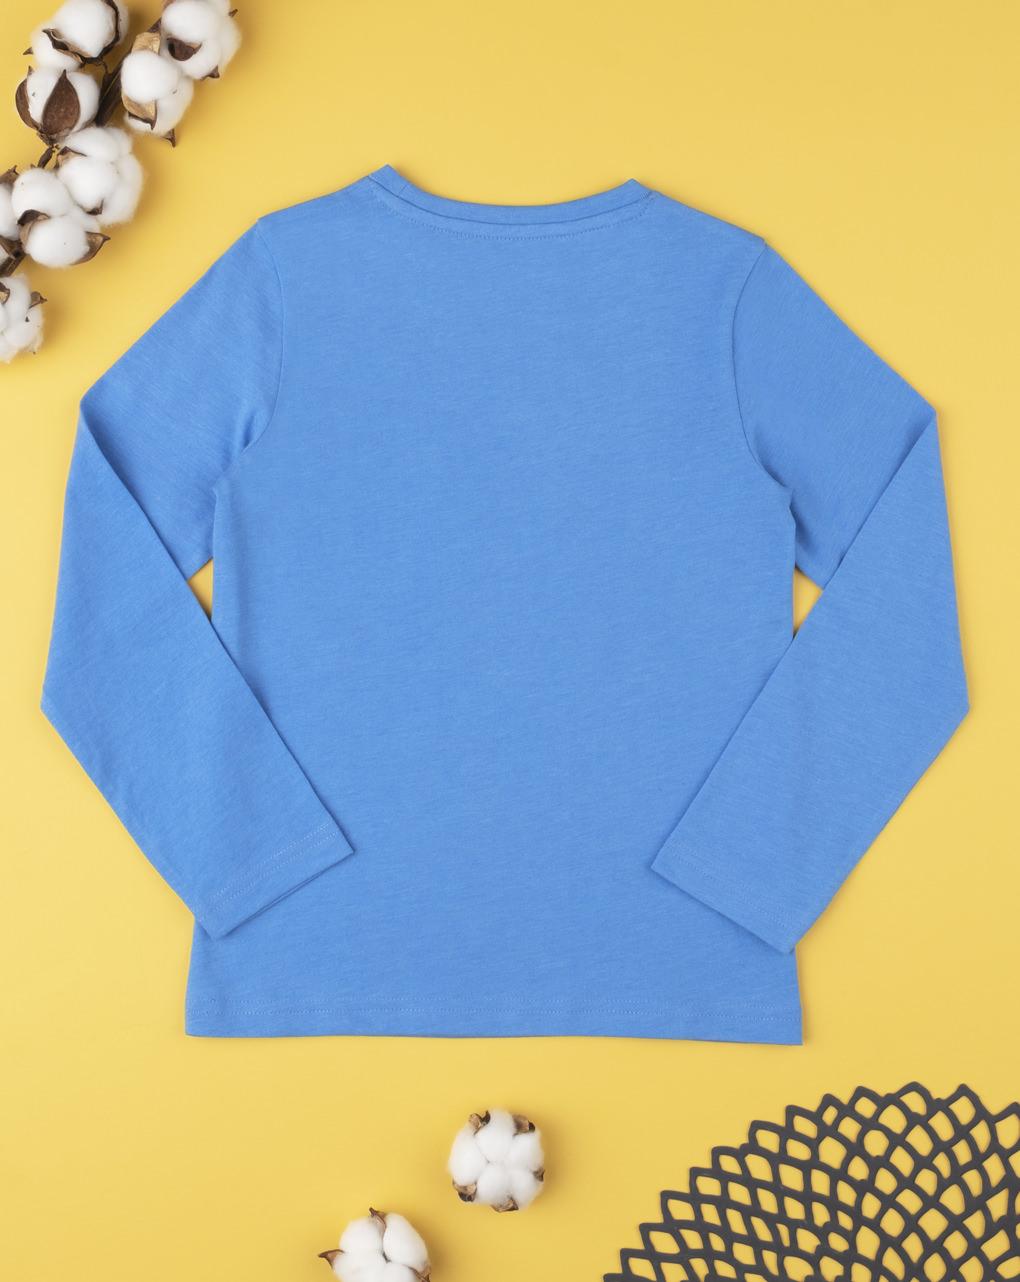 Camiseta azul claro lisa - Prénatal